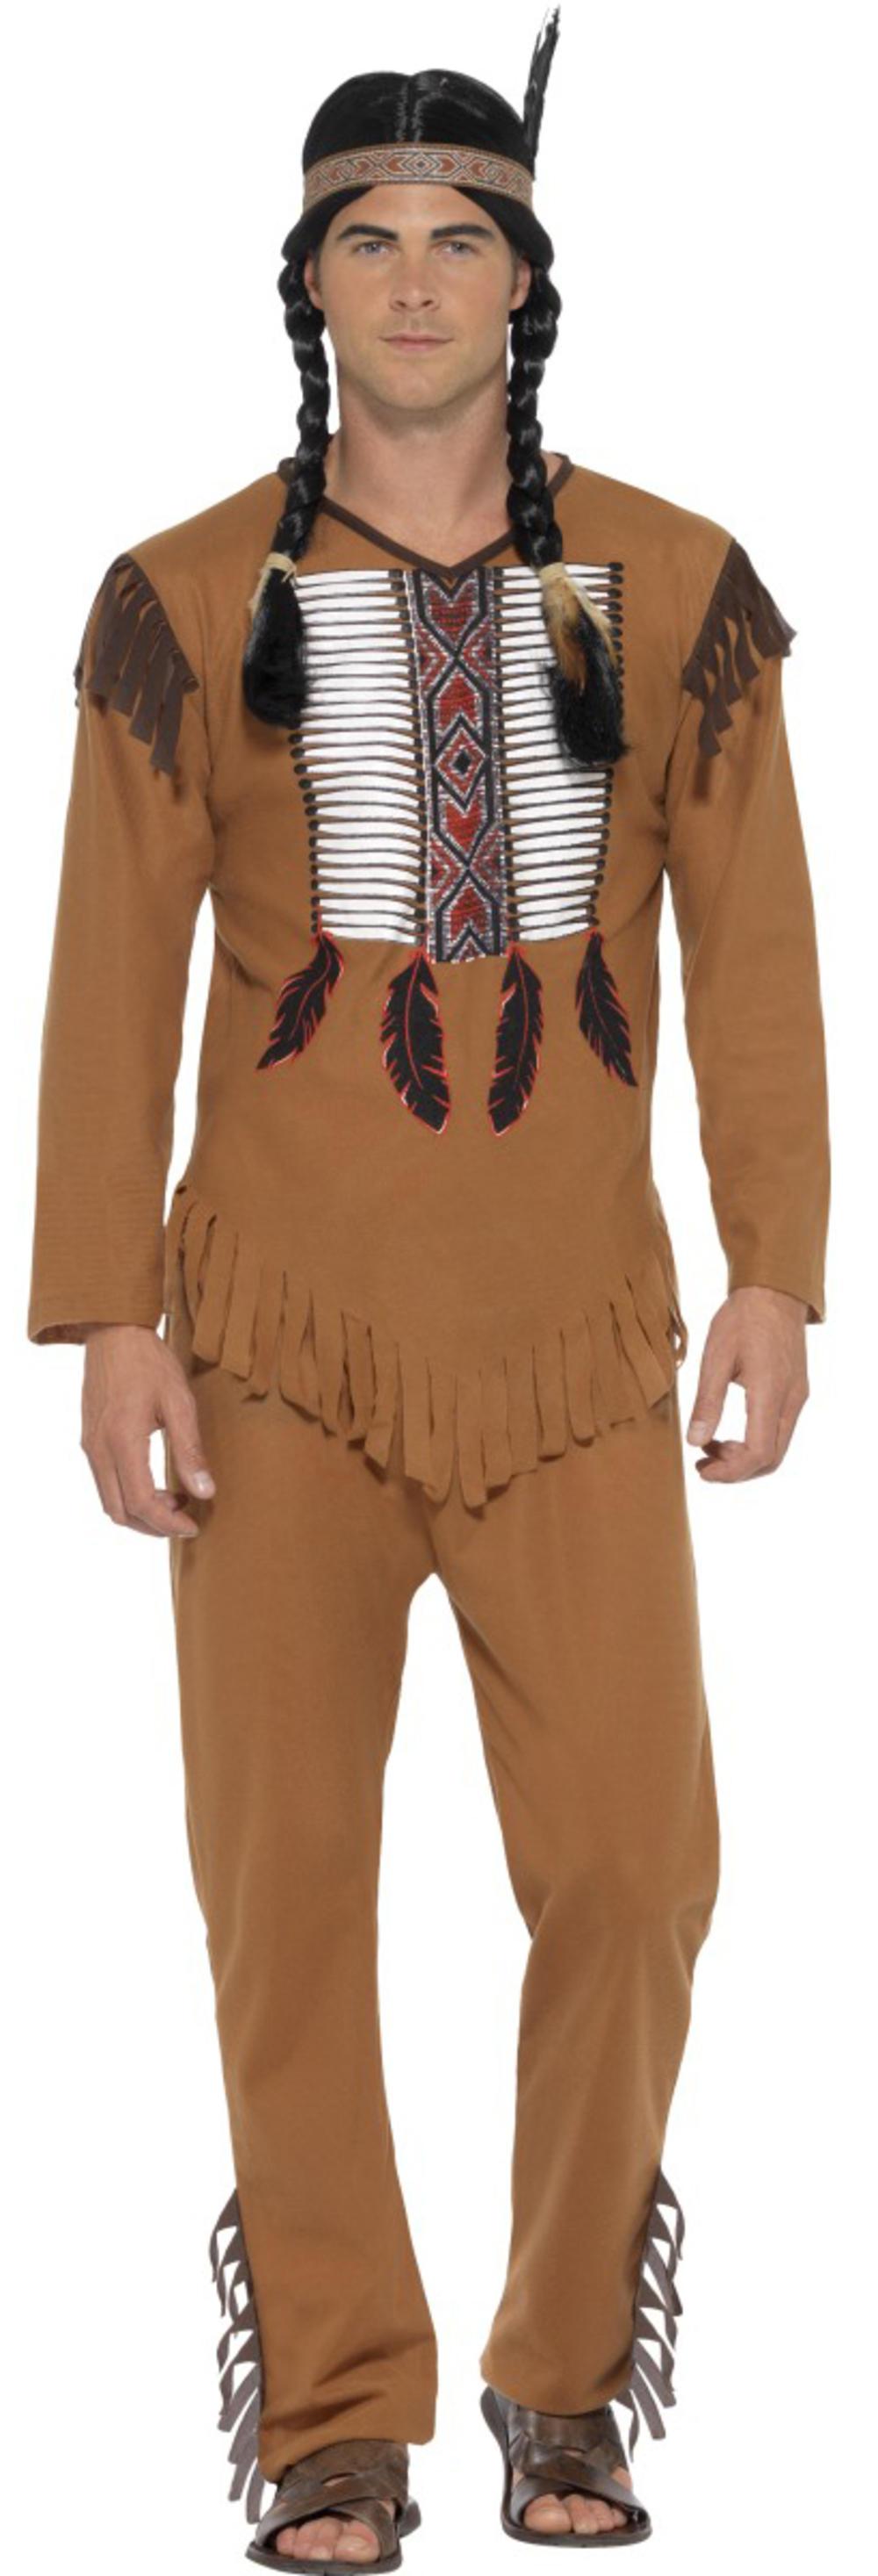 Native American Mens Fancy Dress Wild West Western Tribal Warrior Adults Costume